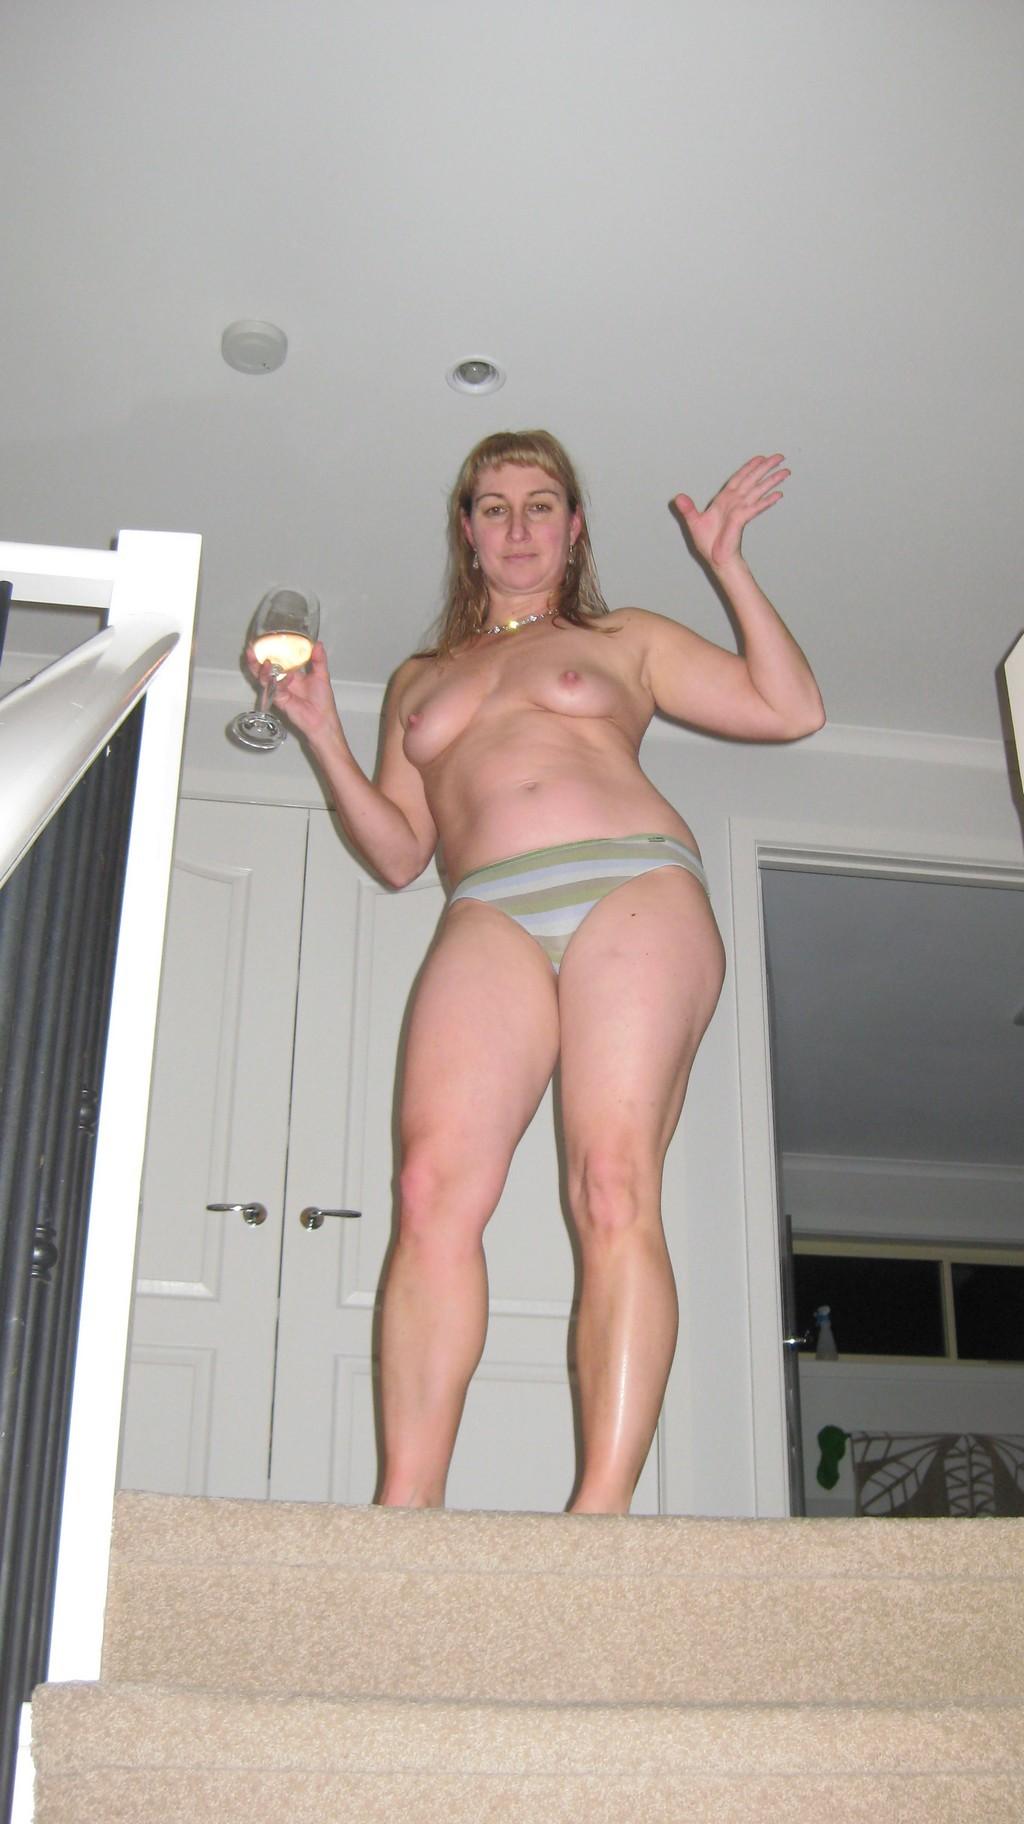 Зрелая ирландка гуляет по дому голая